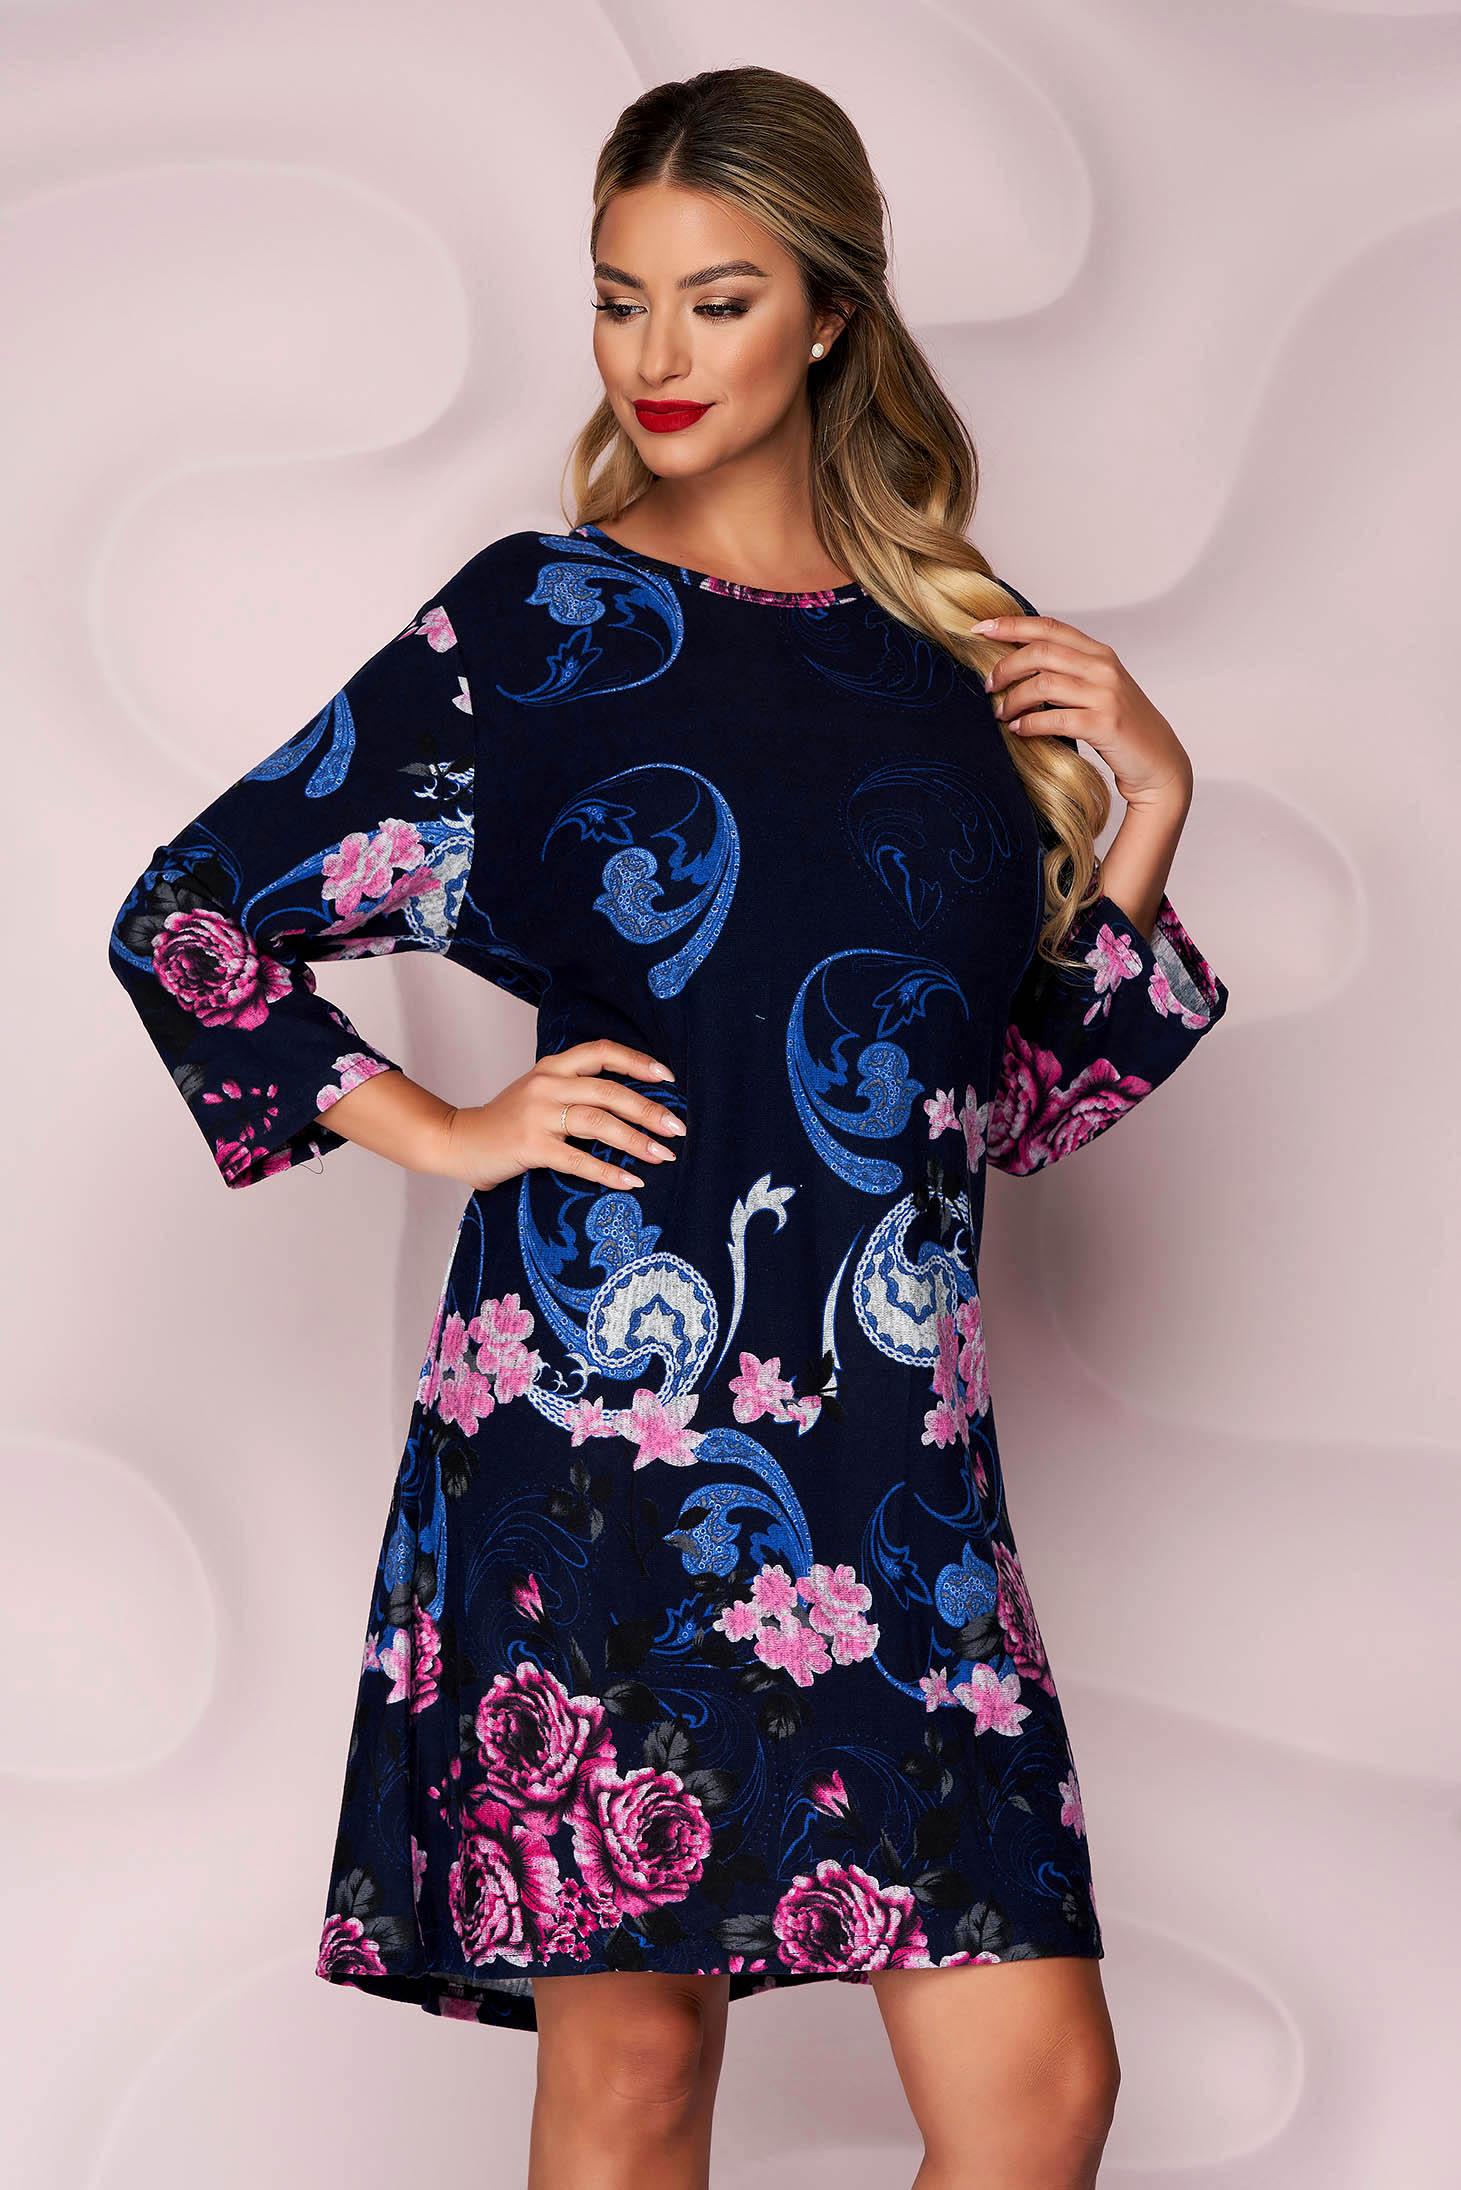 Rochie Lady Pandora albastru-inchis din tricot subtire si elastic cu un croi drept si imprimeu floral